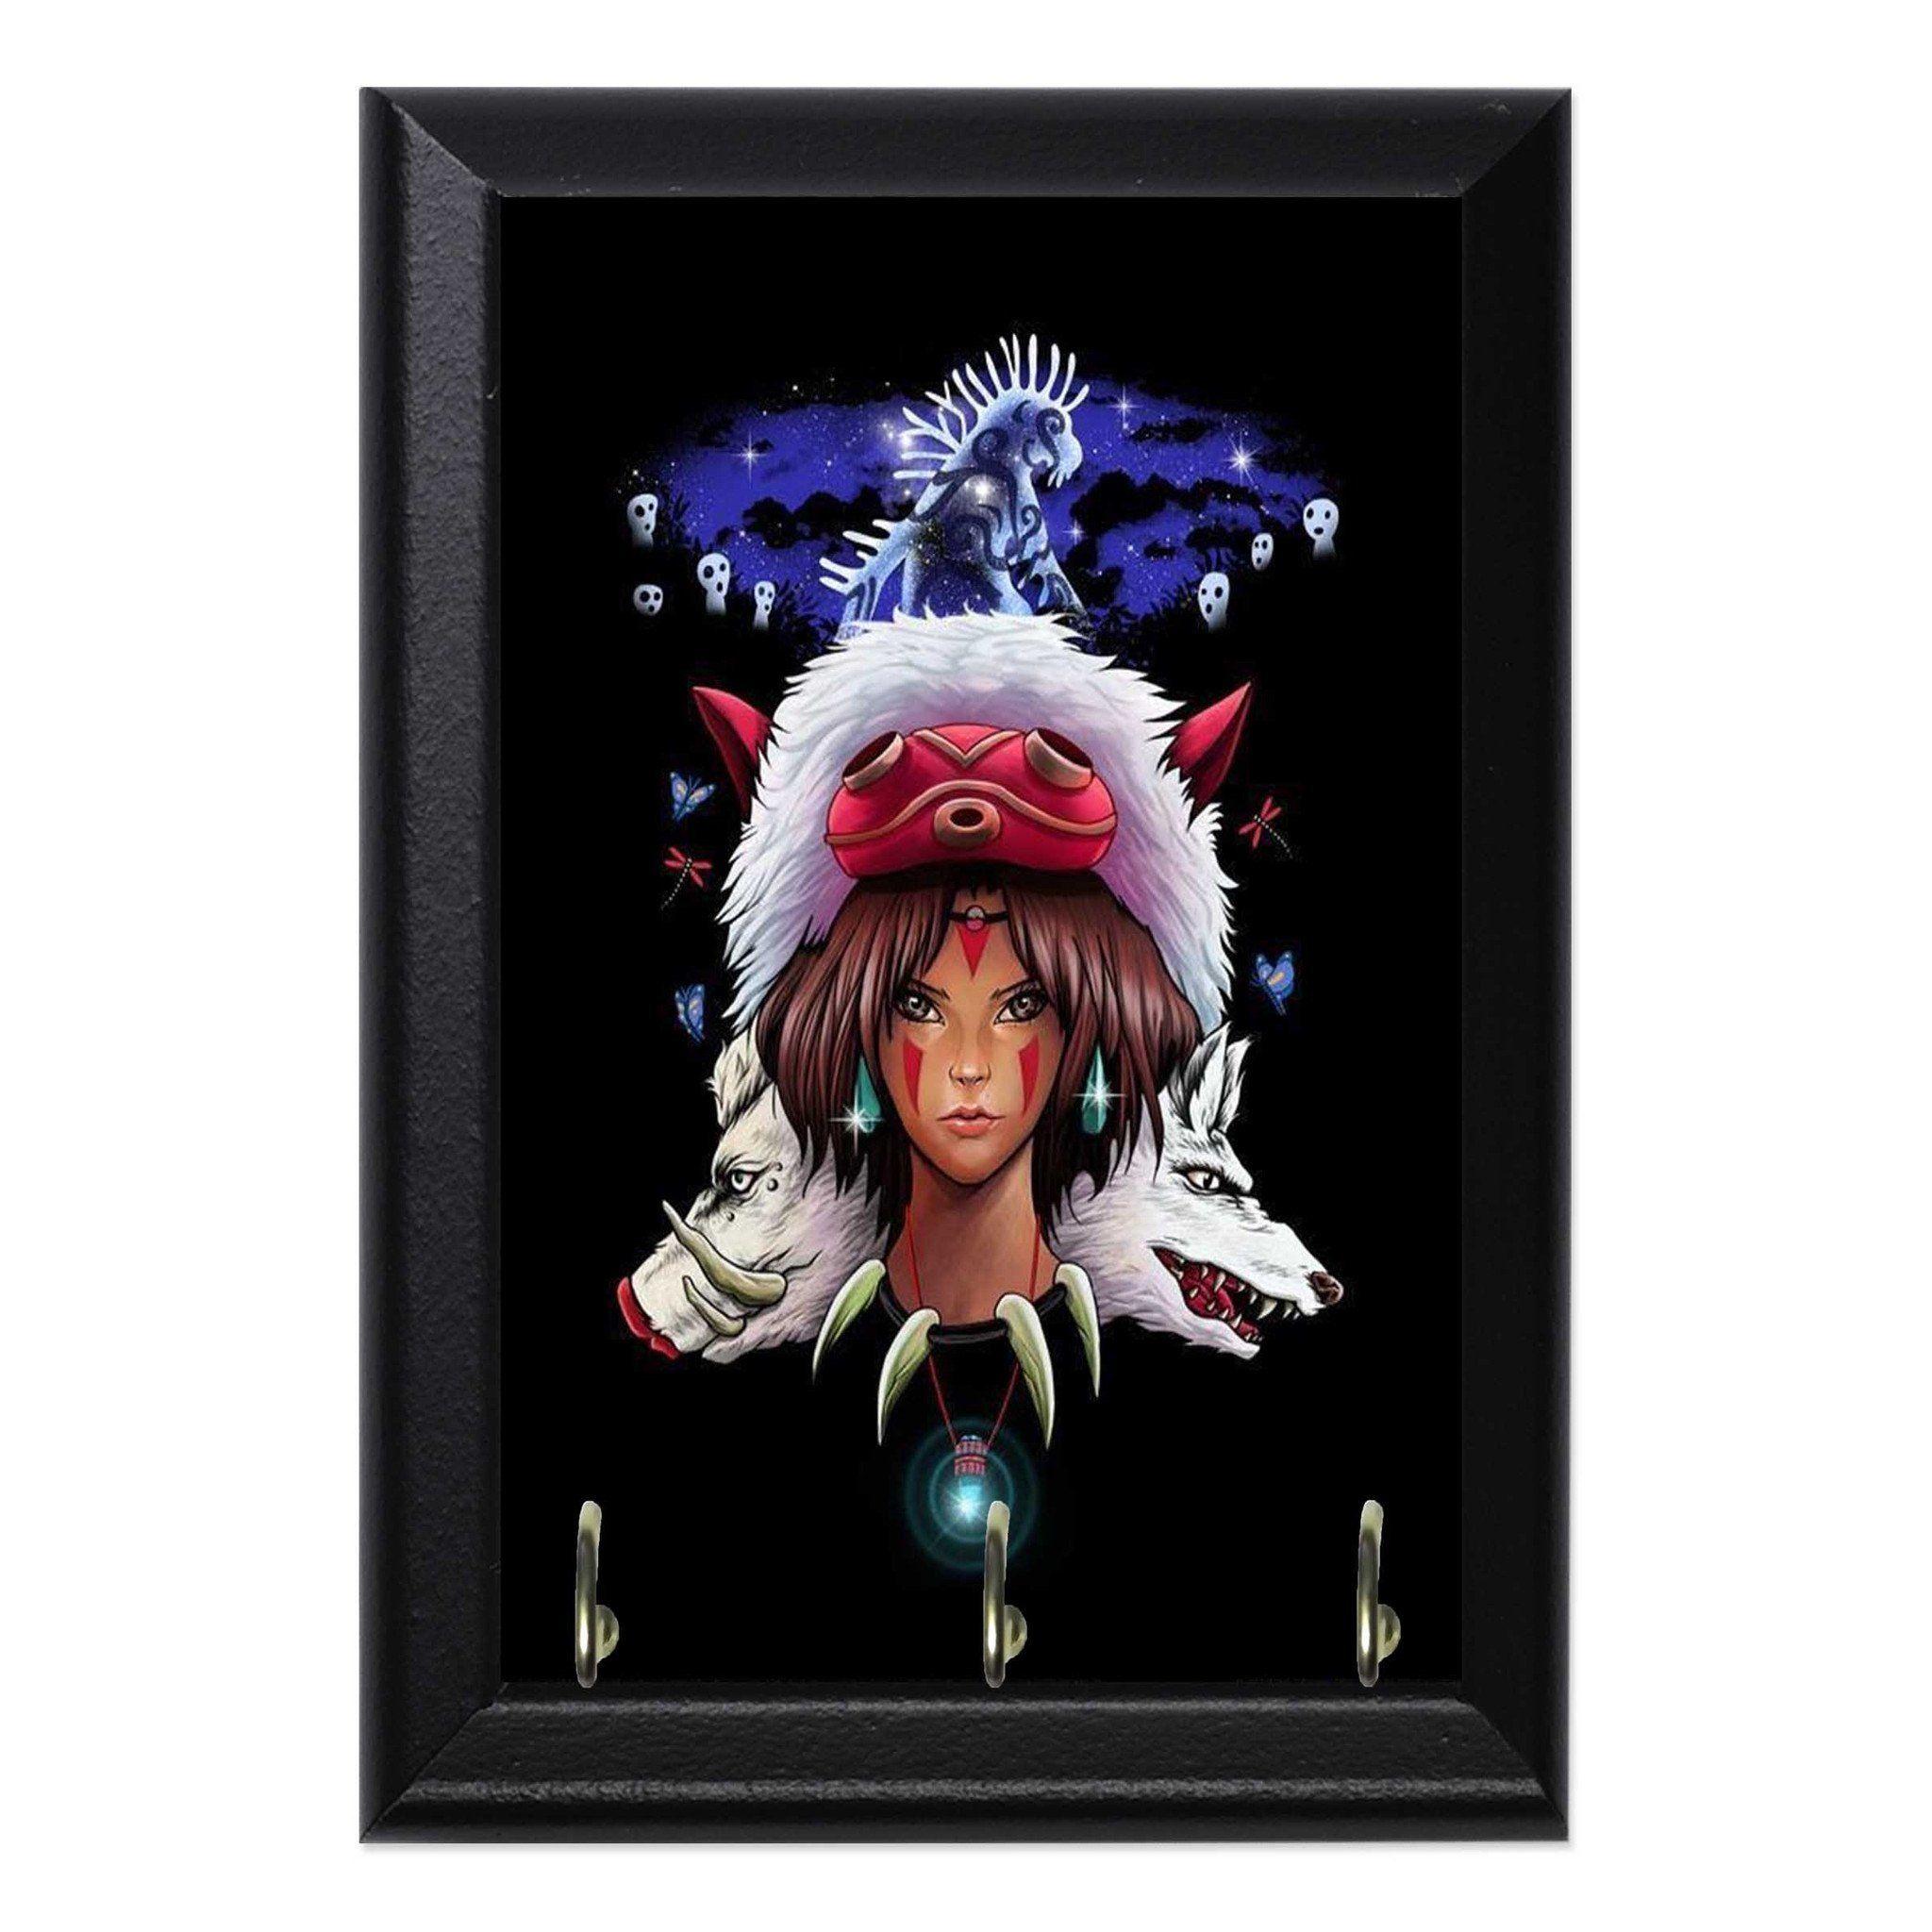 Photo of Princess Mononoke Anime Geeky Wall Plaque Key Holder Hanger – 8 x 10 / No